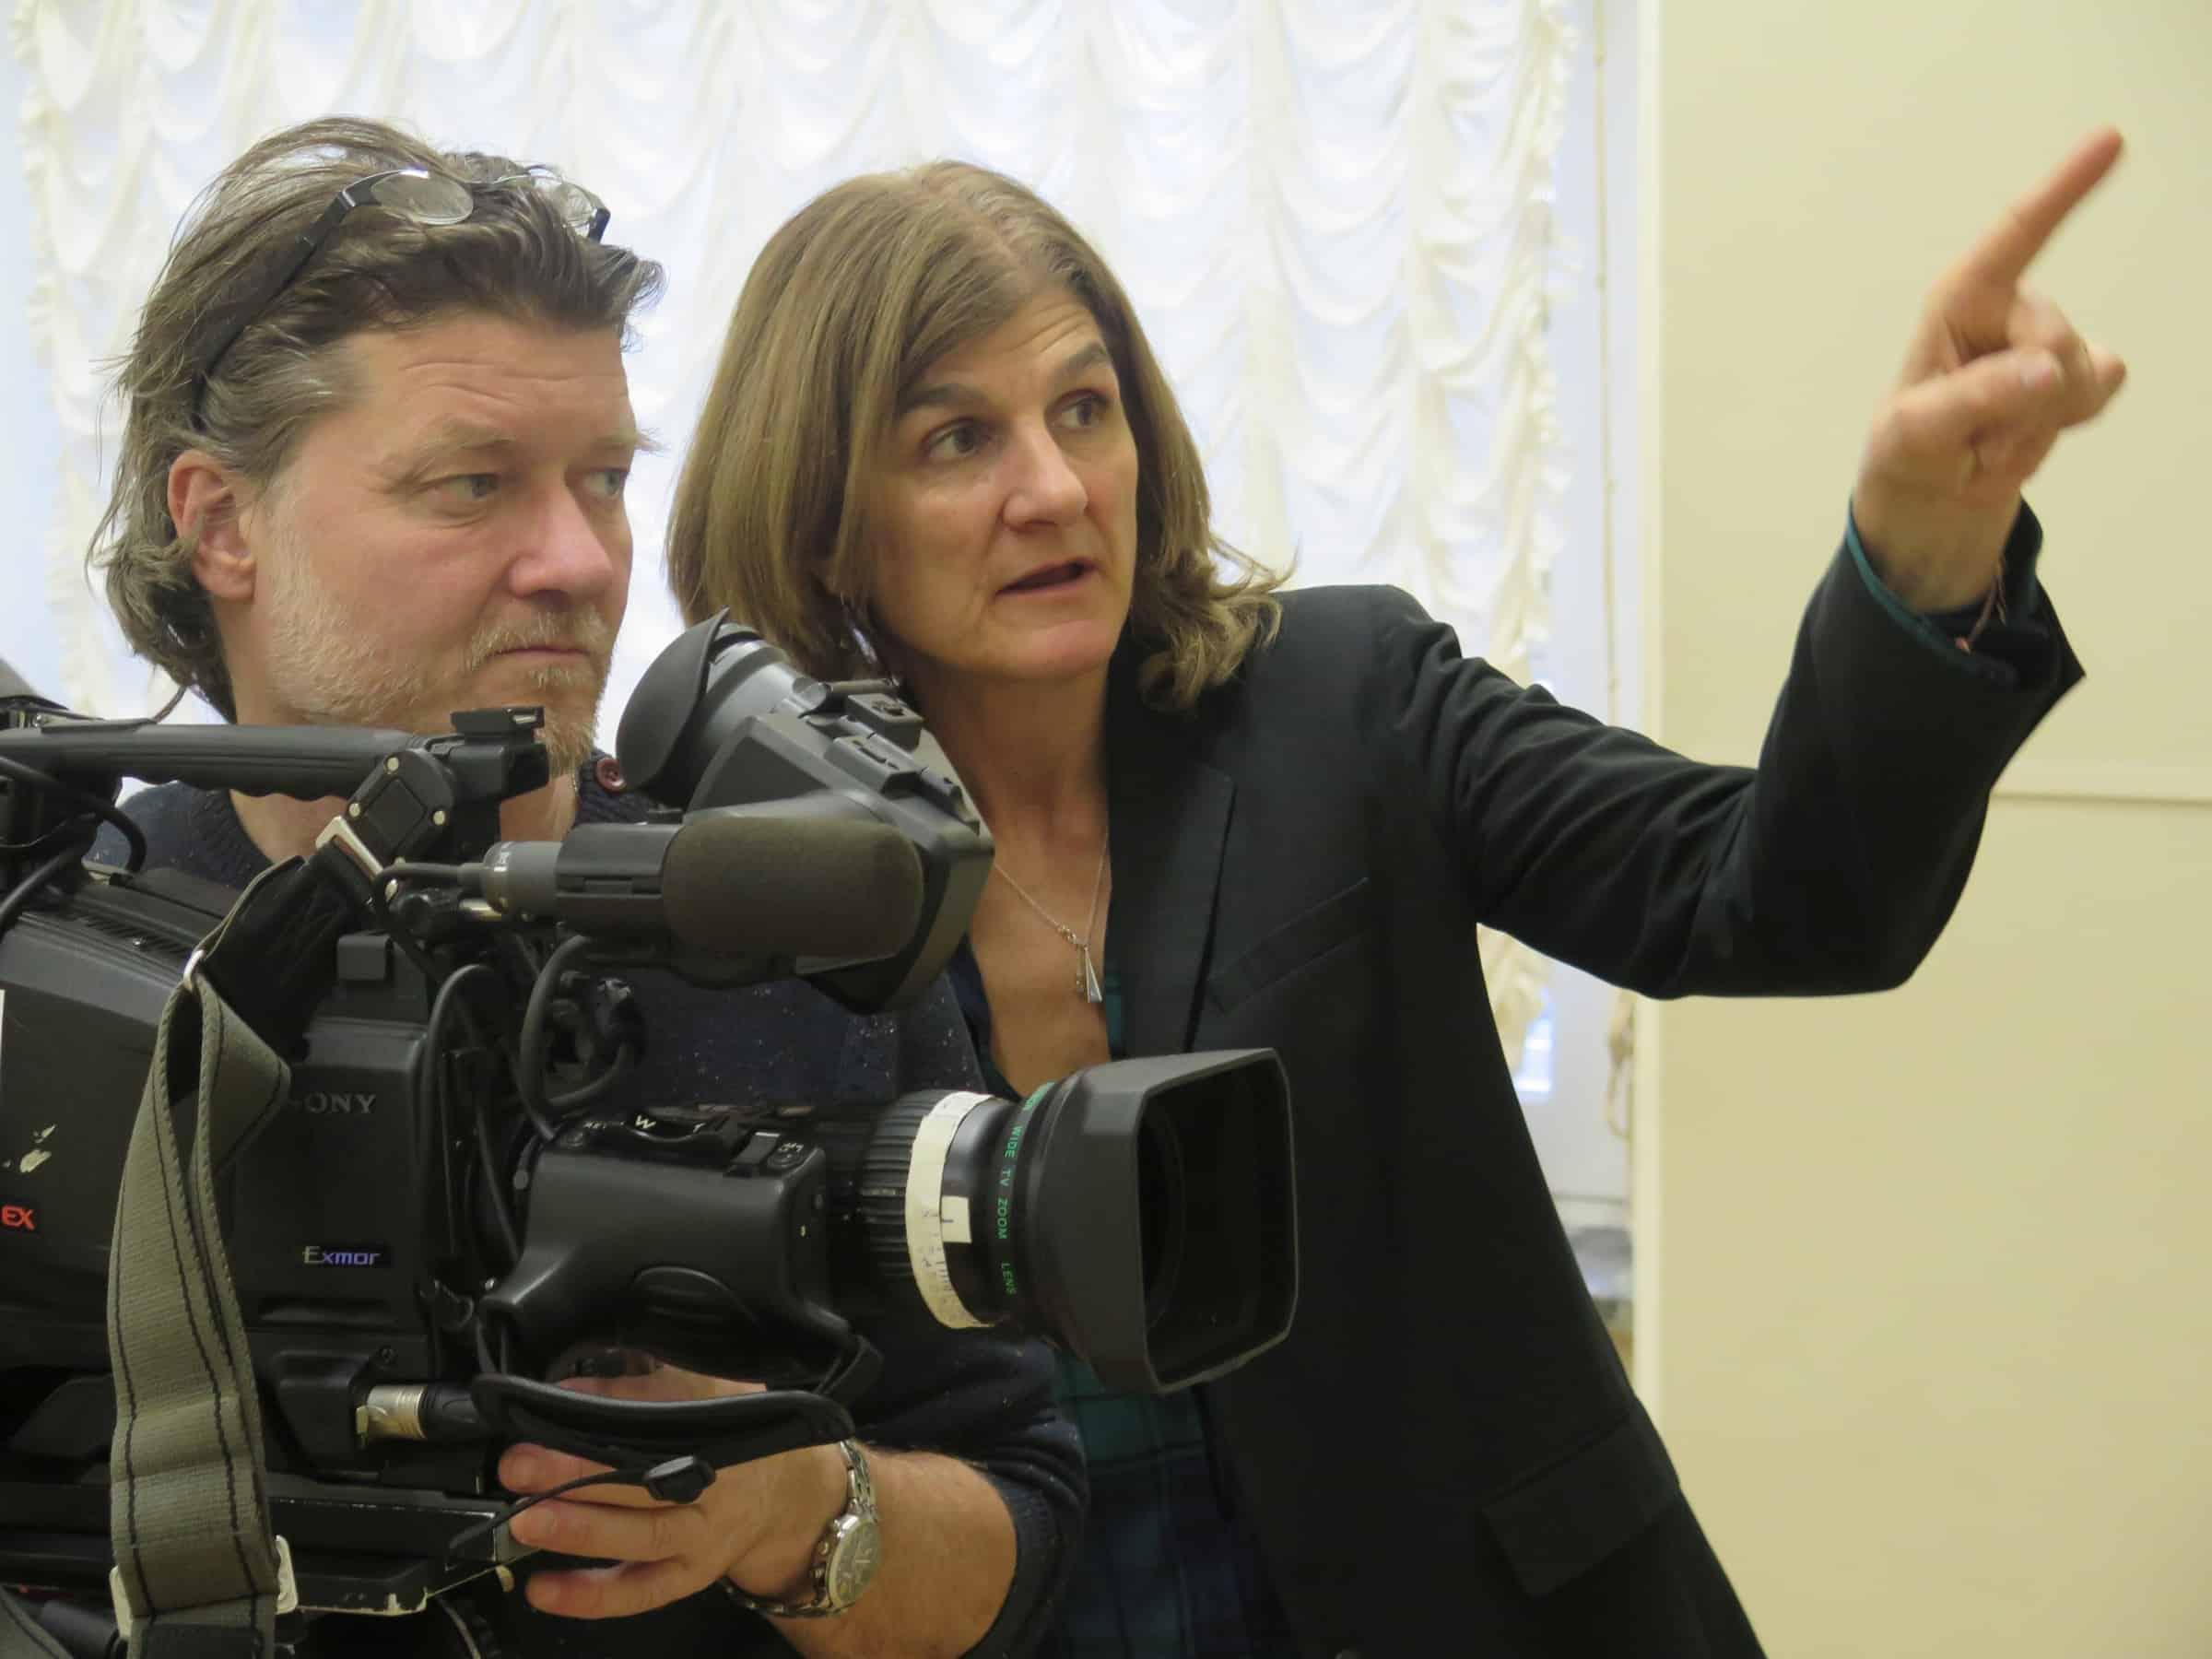 Director of Photography Maxim Tarasyugin and Margy Kinmonth